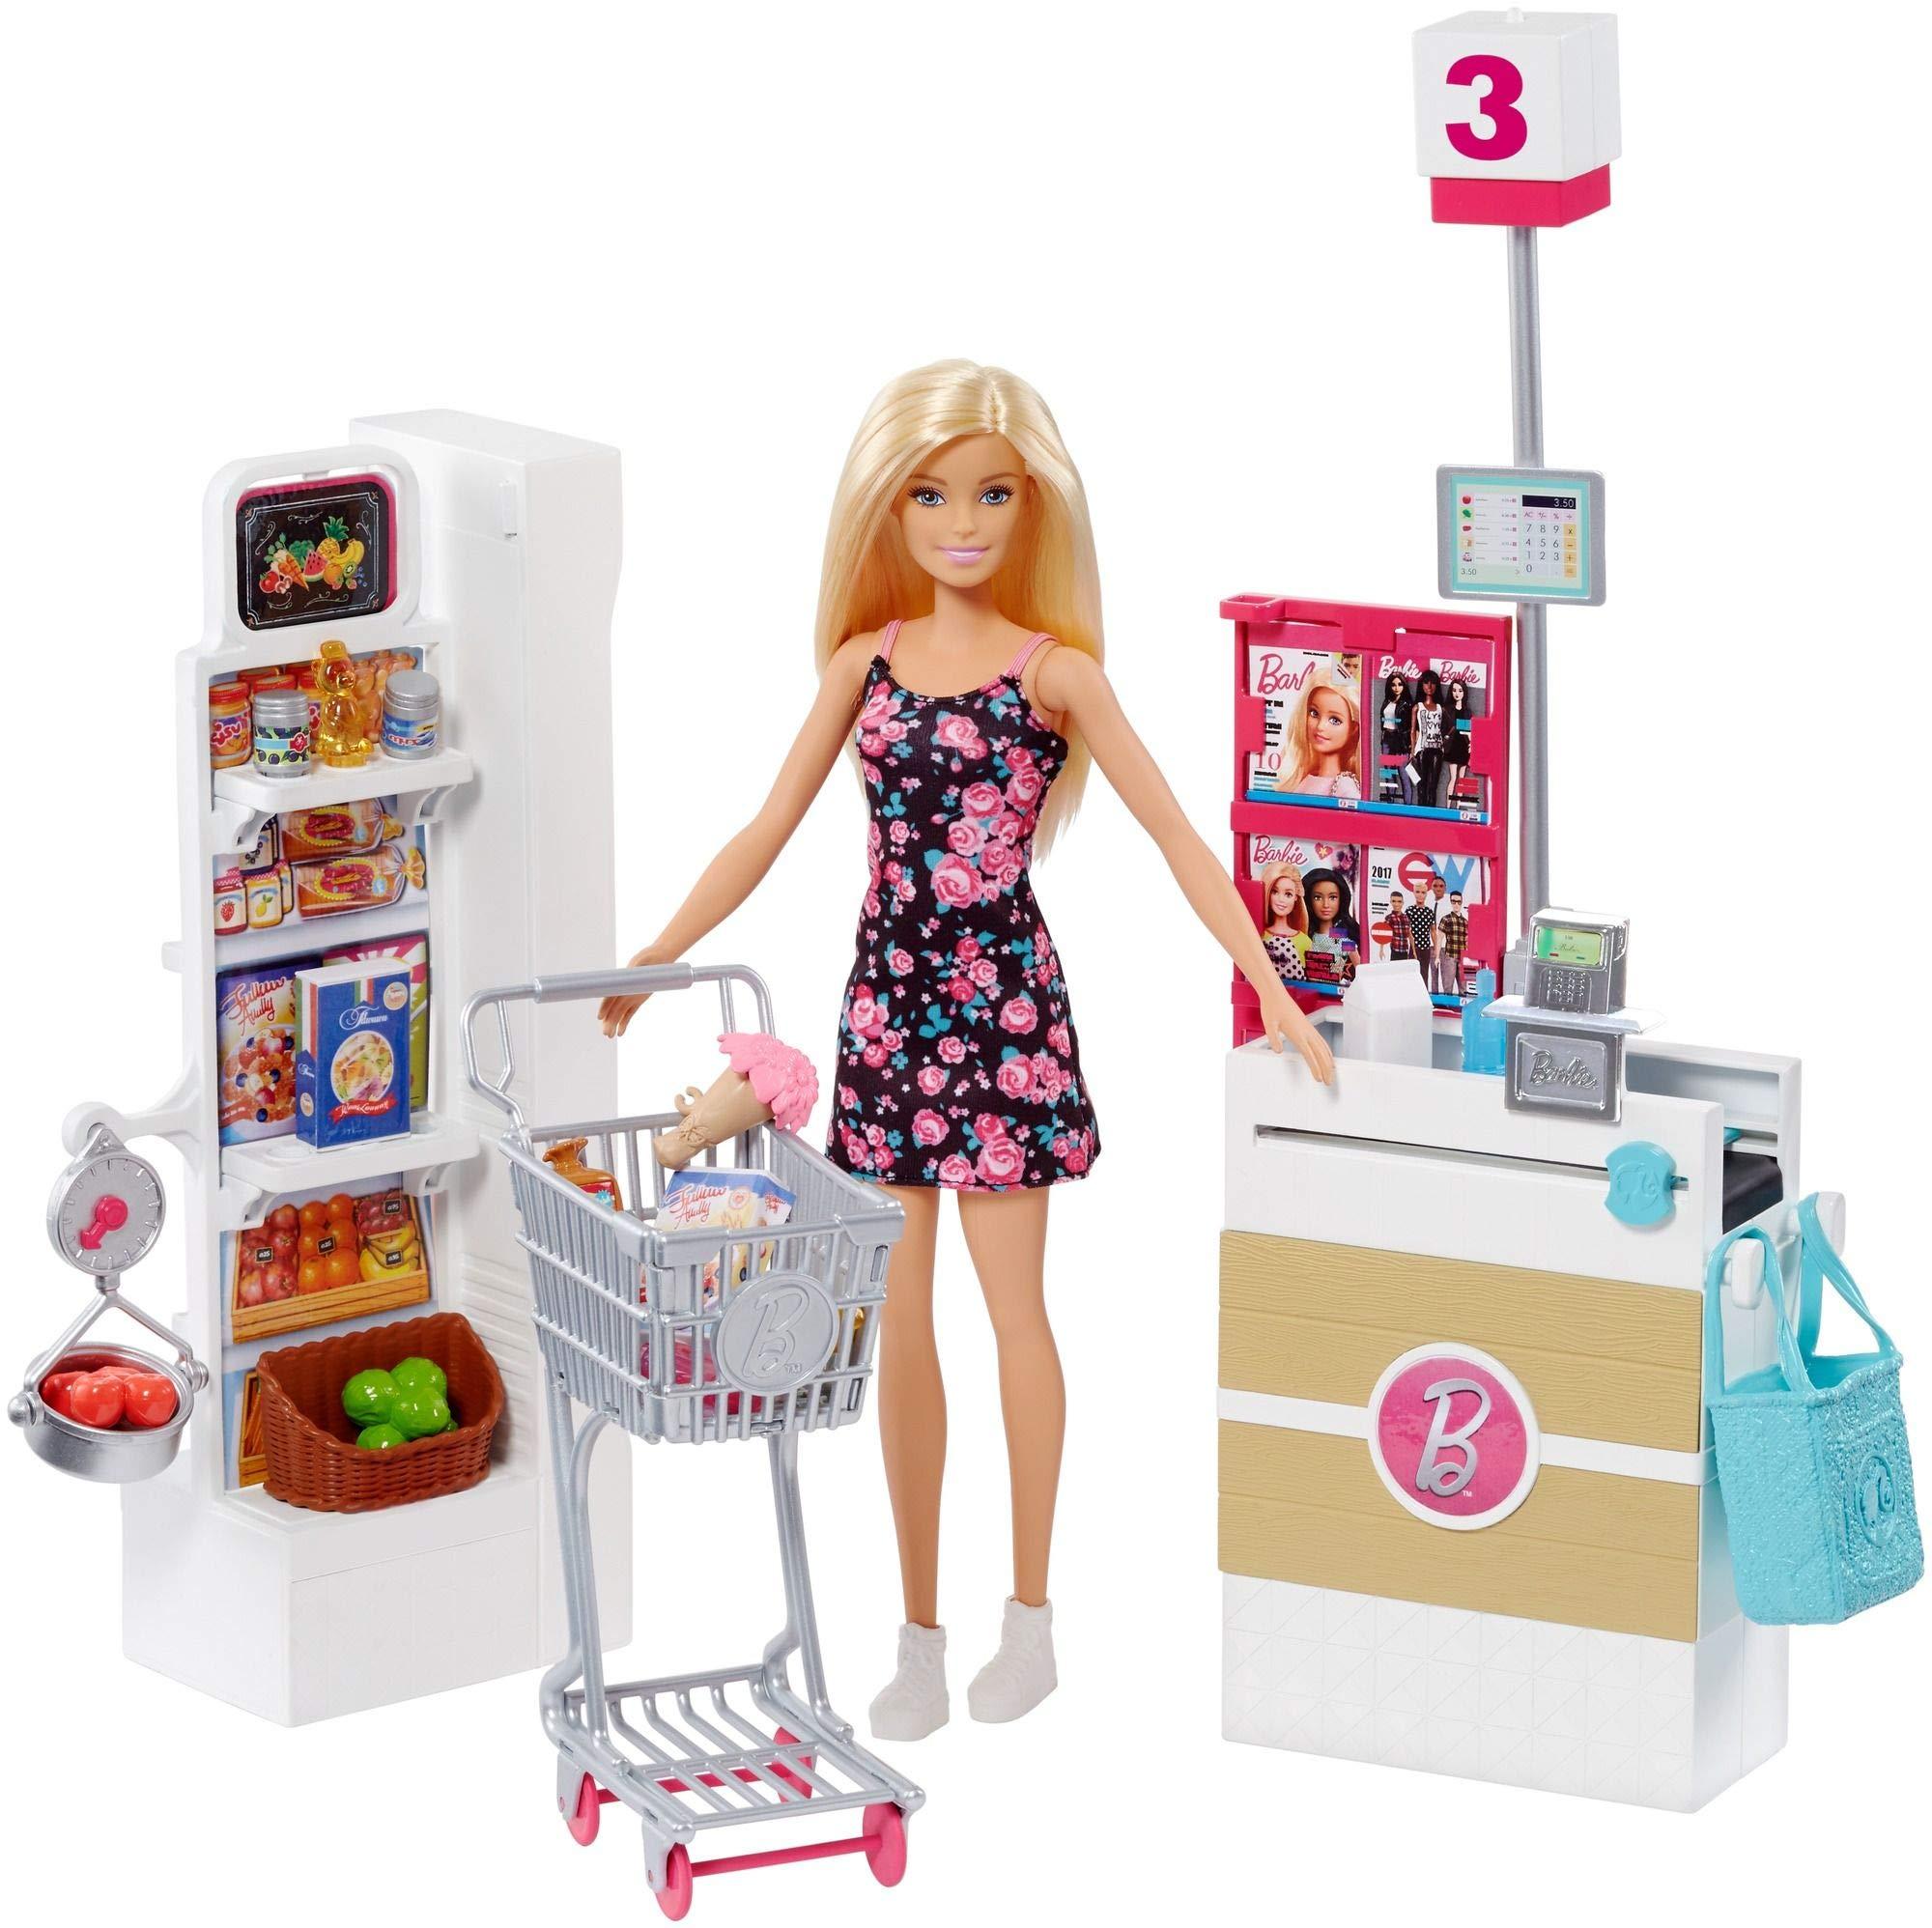 Barbie Supermarket Set, Blonde by Barbie